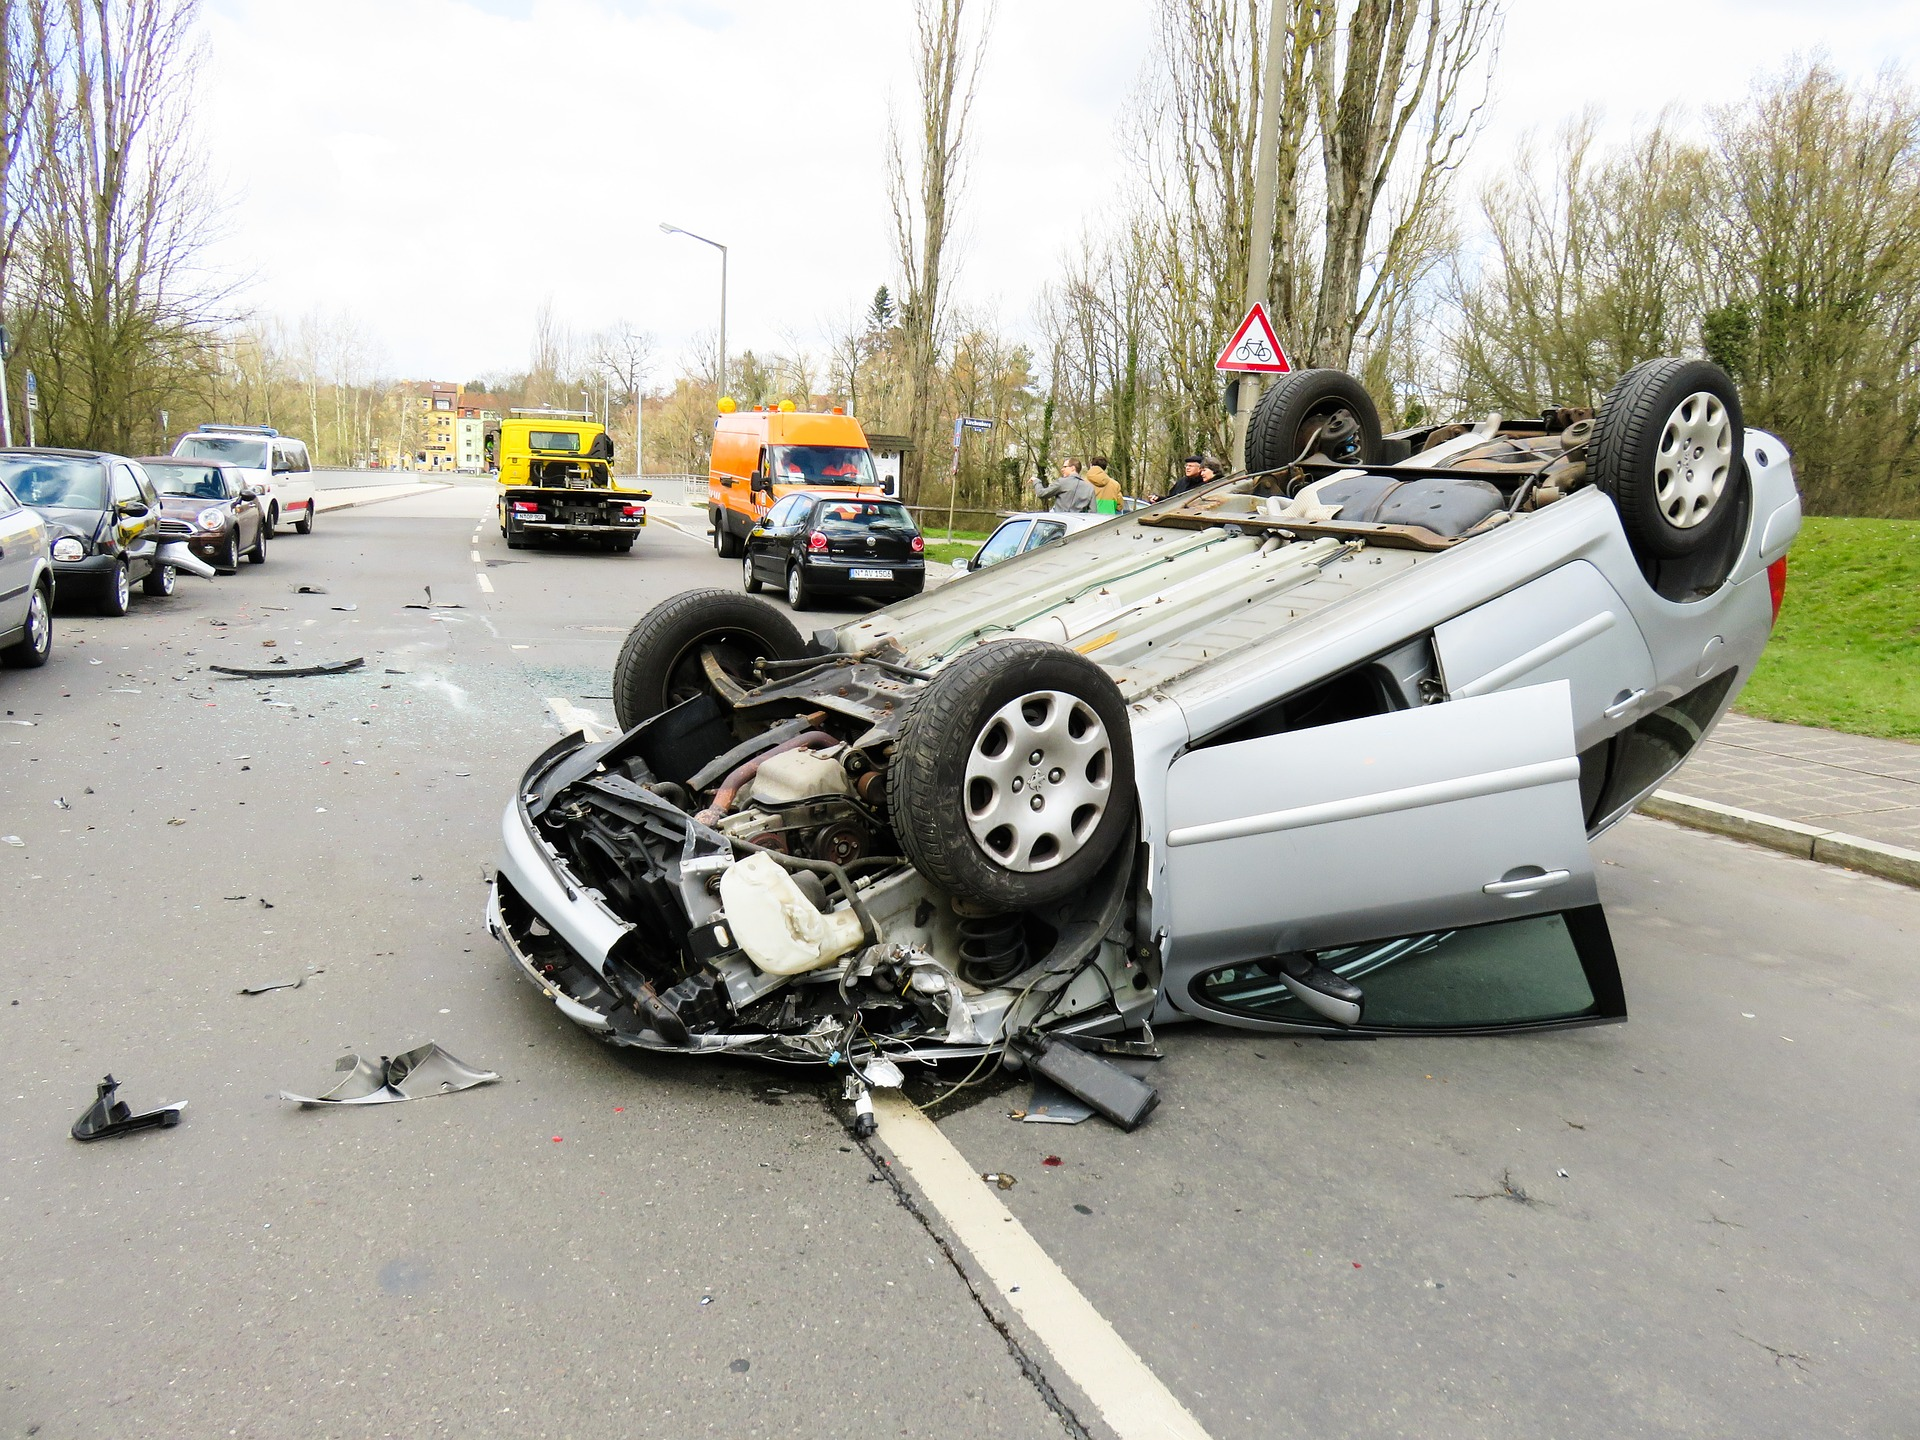 accident-1409012_1920.jpg